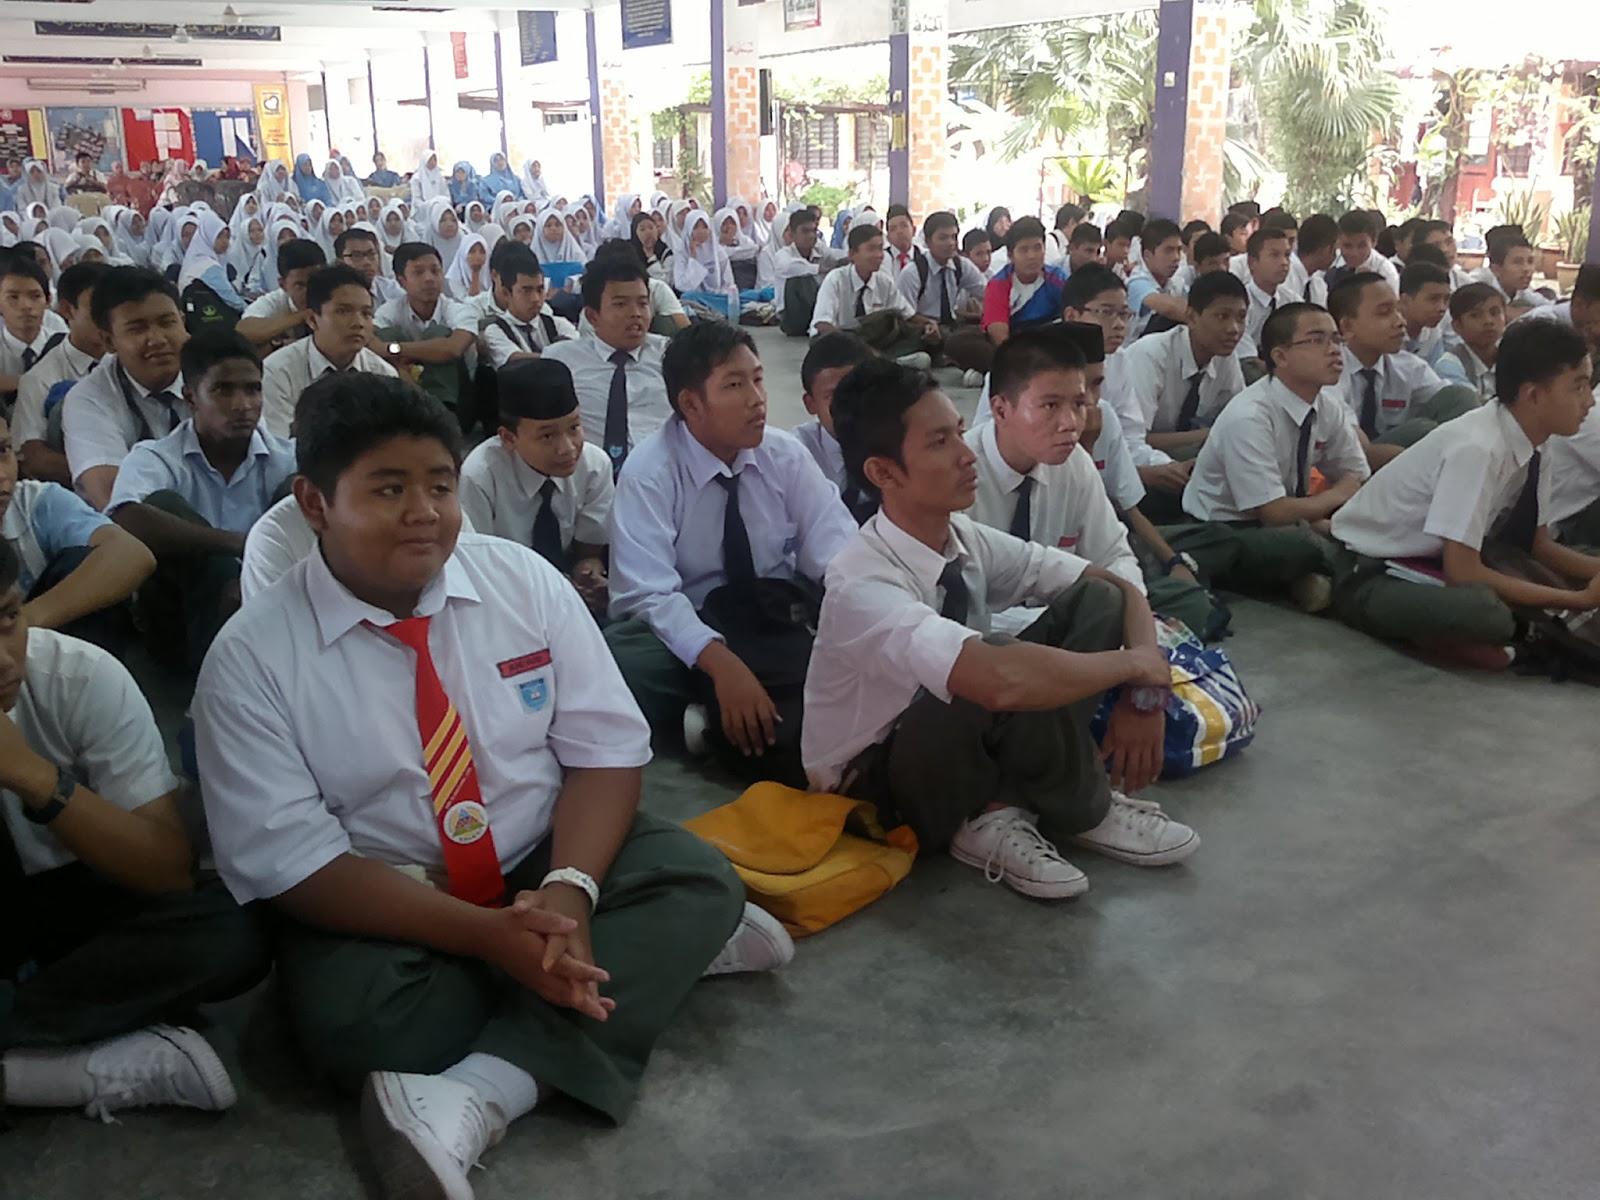 Peranan Pelajar Memupuk Budaya Penyayang Di Sekolah